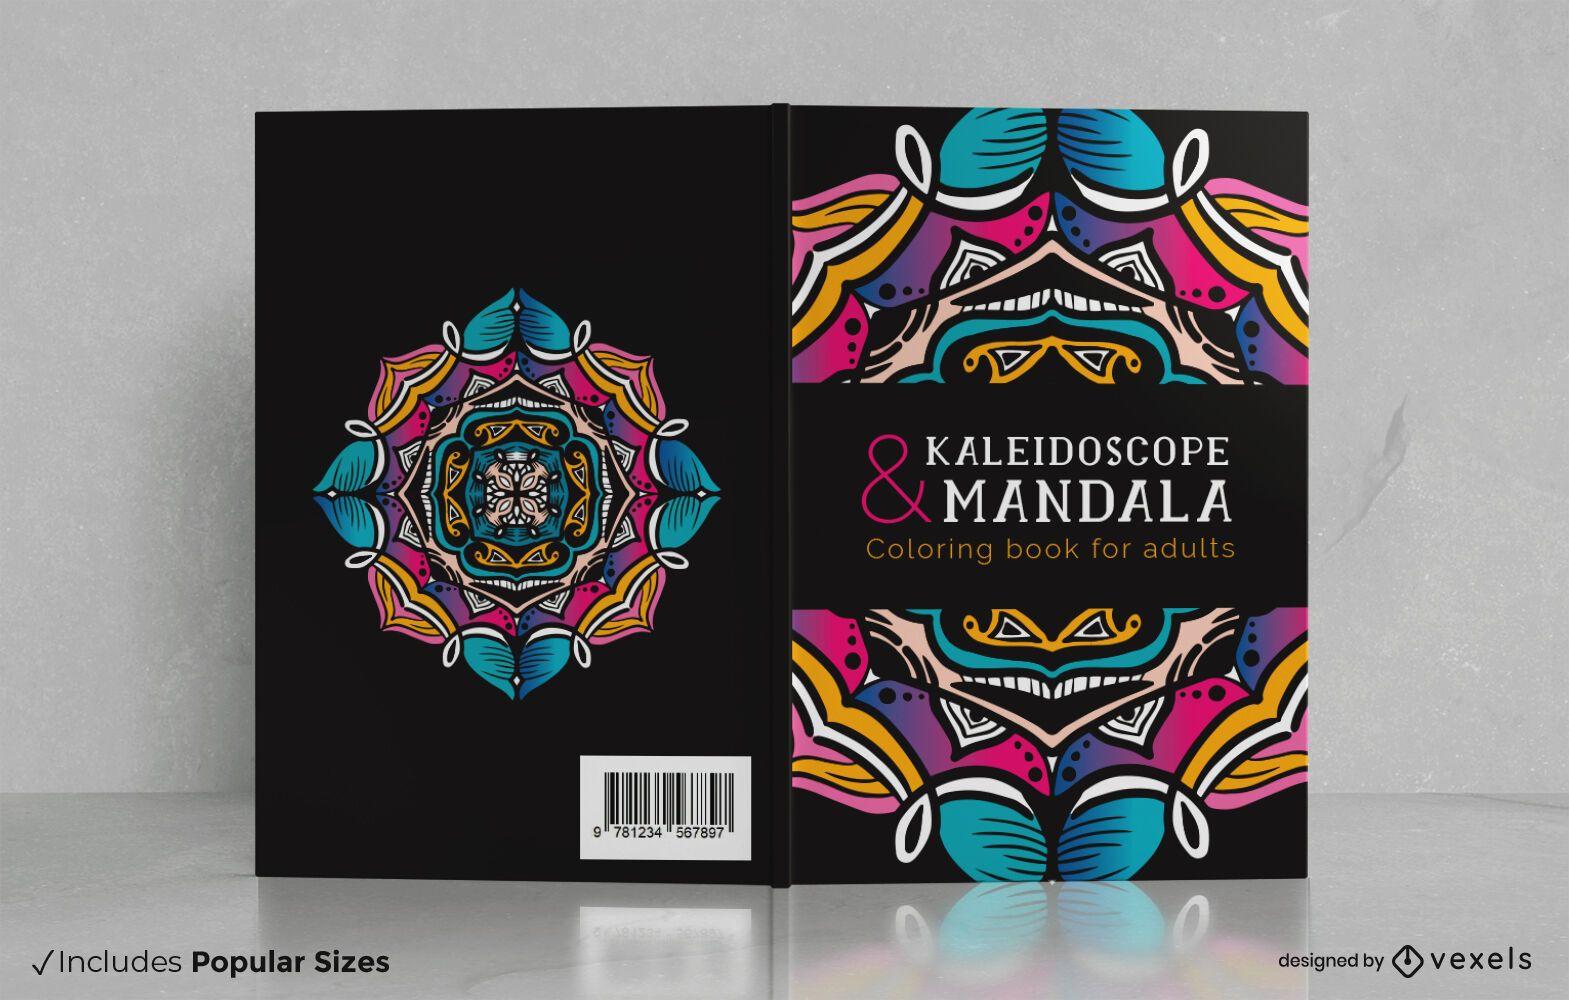 Mandala Färbung Erwachsenen Buchcover Design